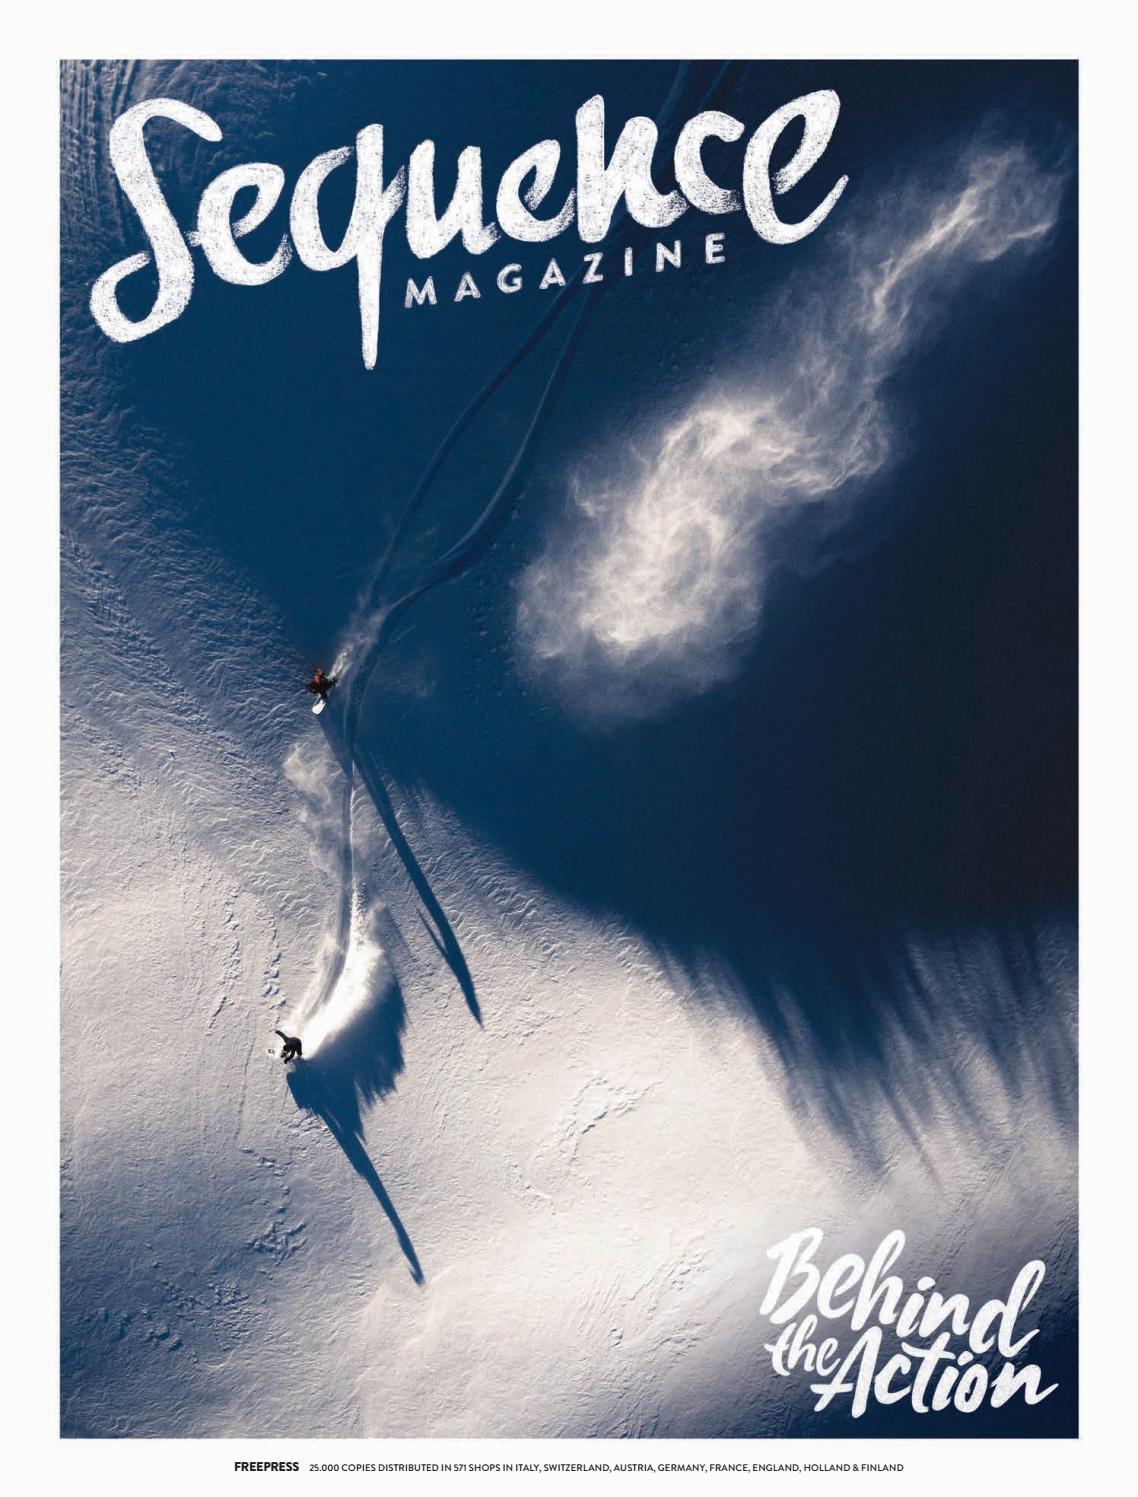 Ab Creative Scandicci sequence magazine 57 en by hand communication - issuu